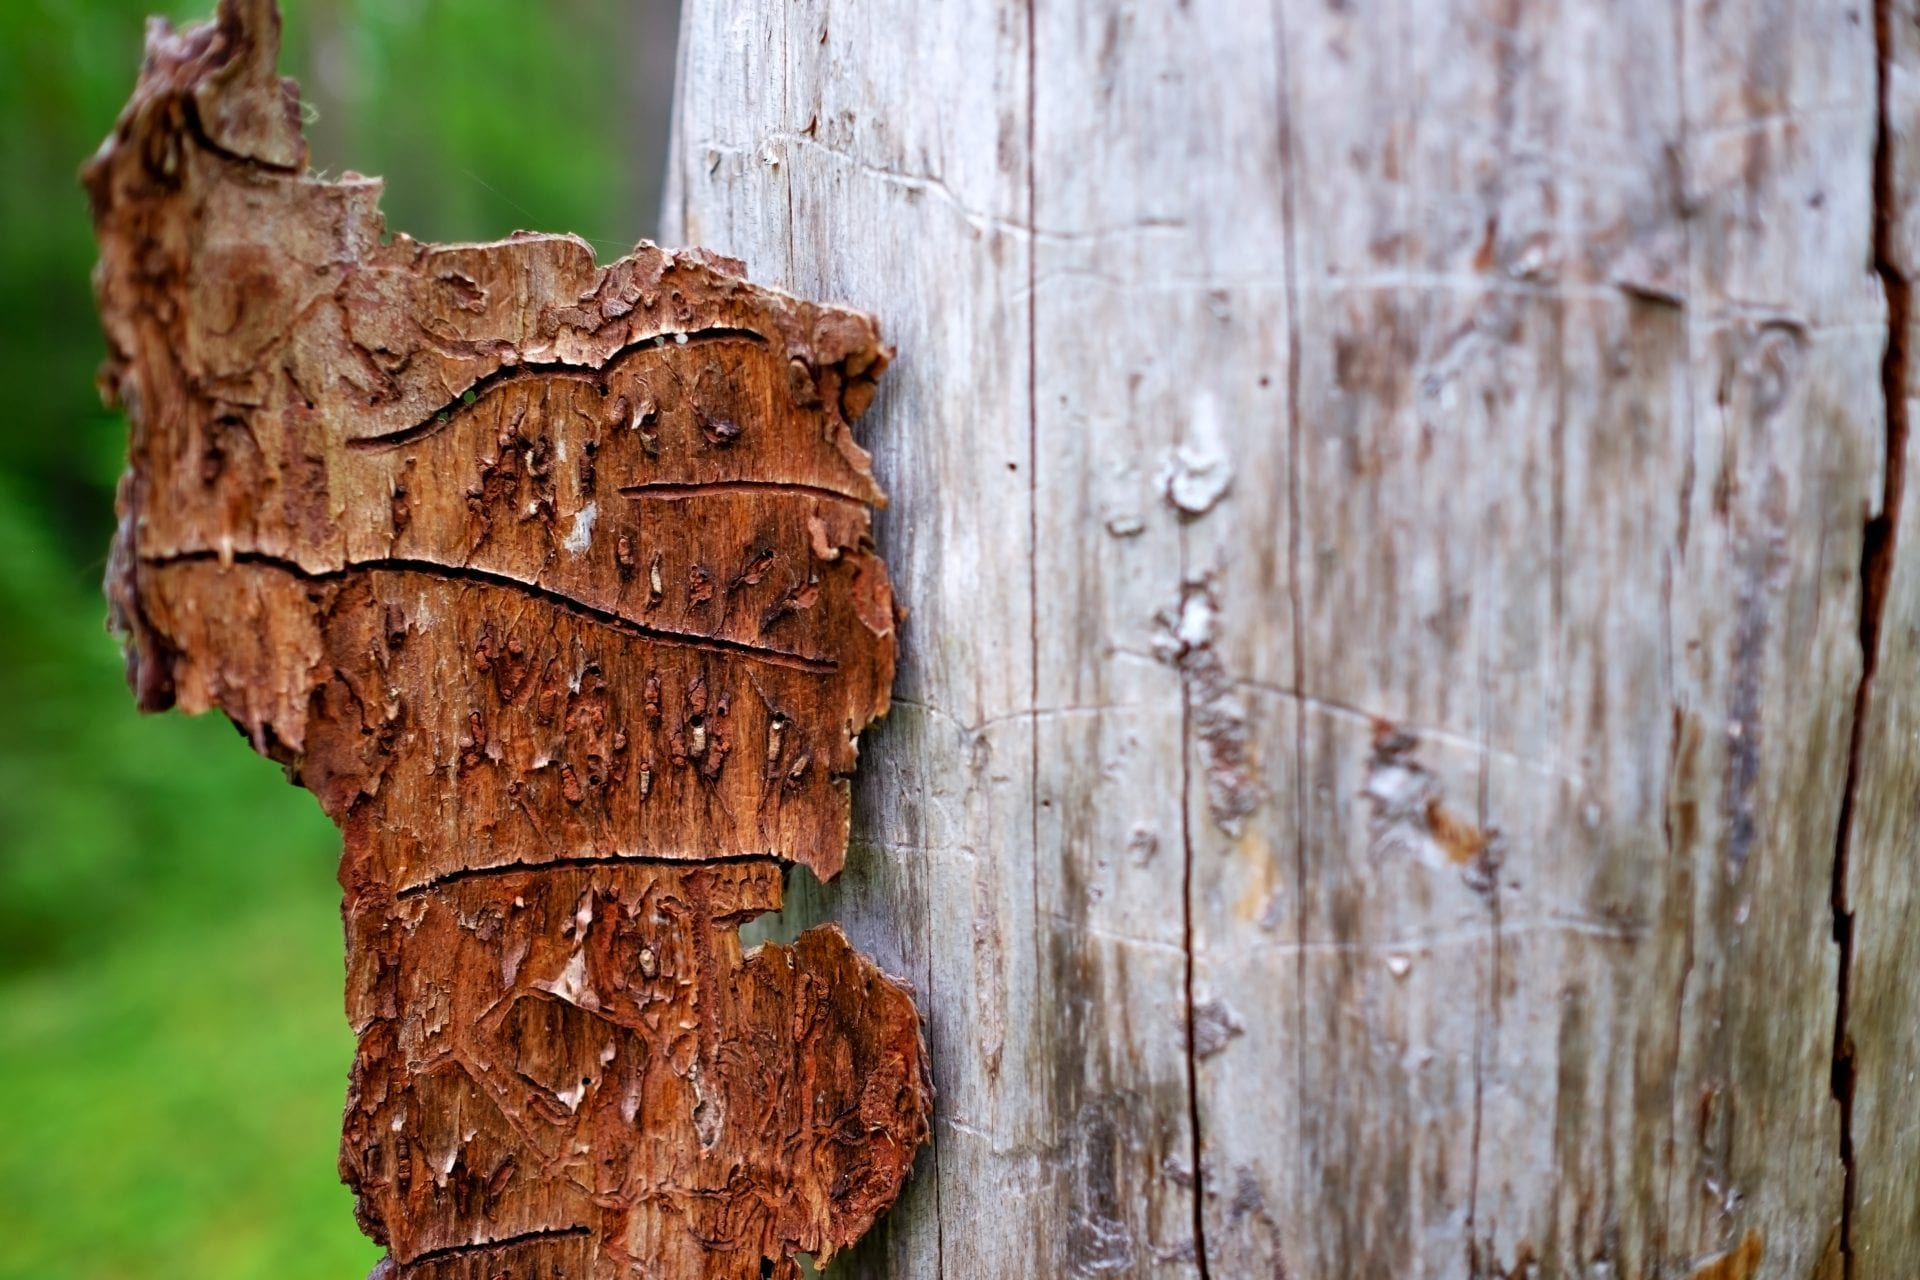 Preventative Spraying For Bark Boring Beetles | Blog | Front Range Arborists